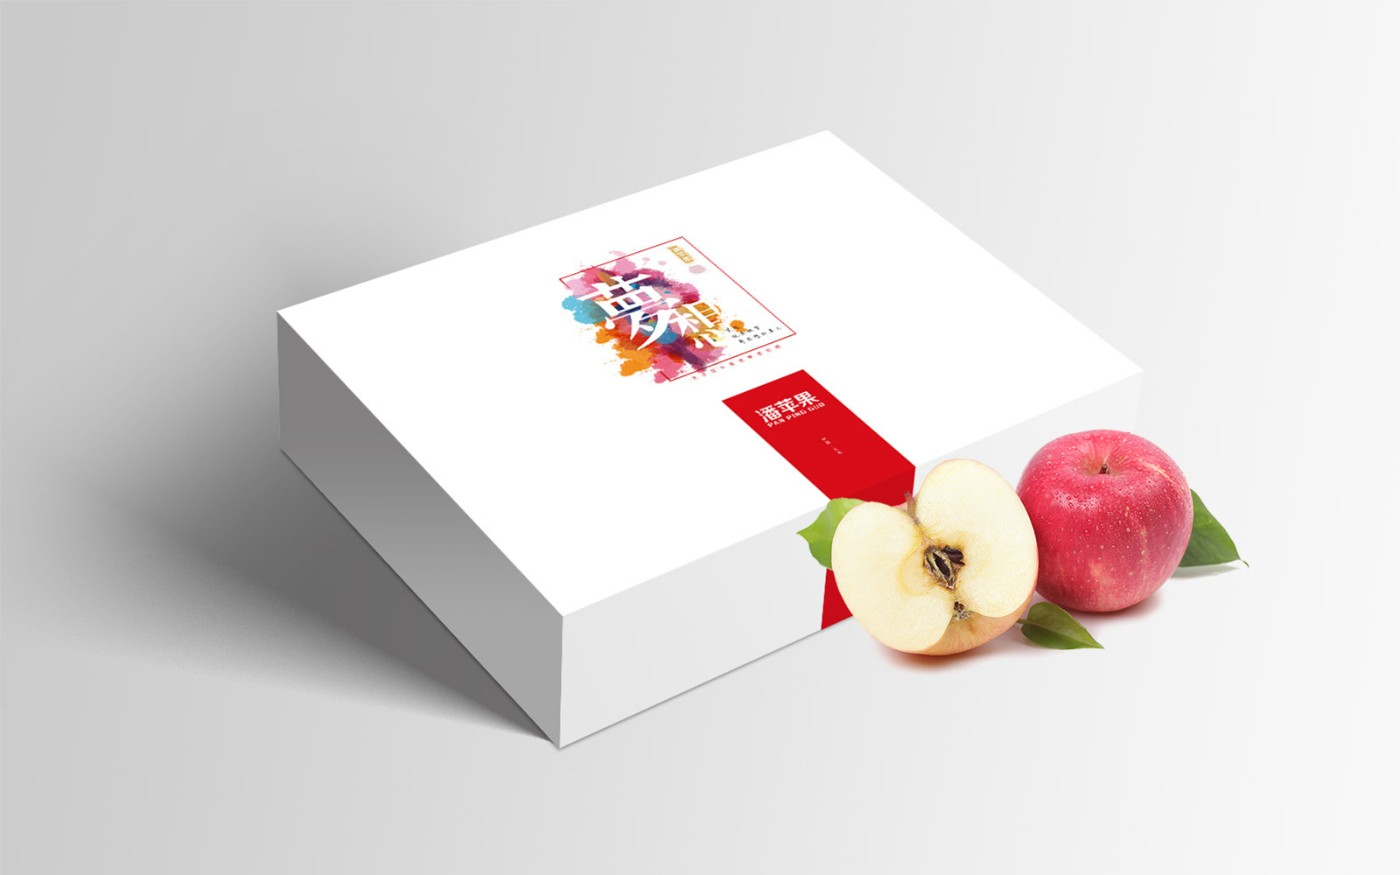 潘苹果<a href='http://www.6chuangyi.com/' title='' style='color:;font-weight:bold'>品牌策划</a>03.jpg